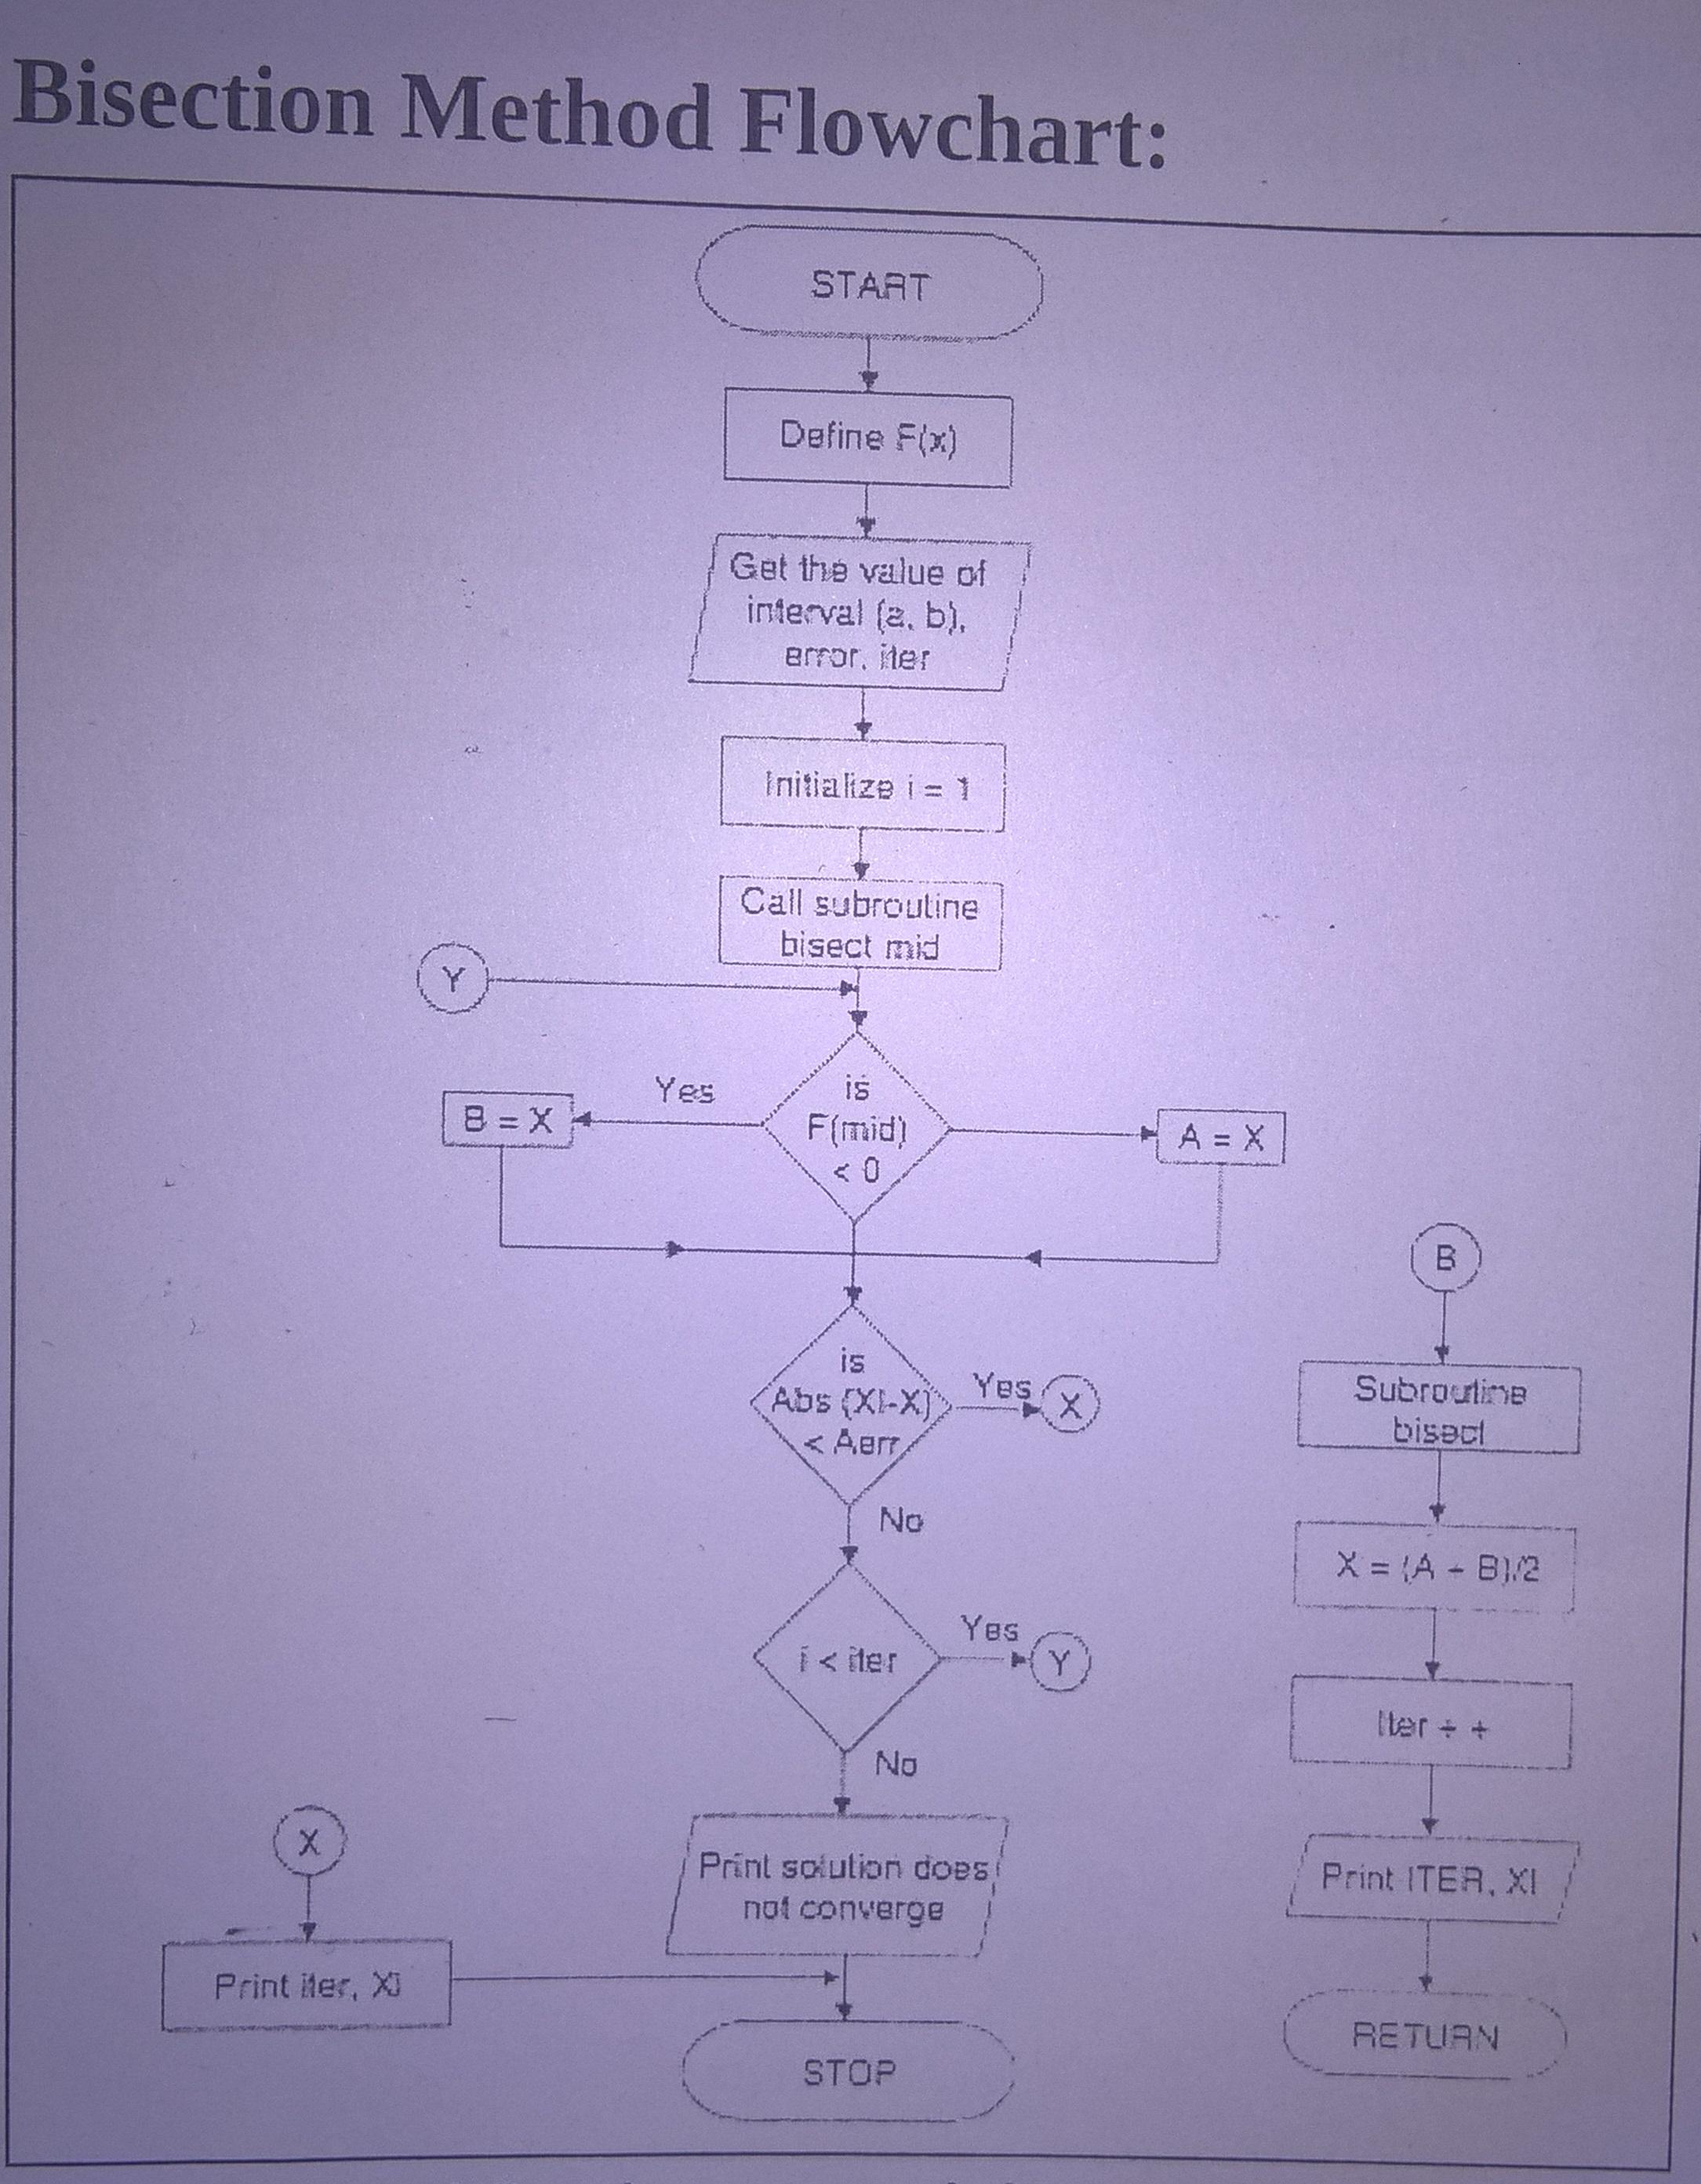 Program For Bisection Method In Fortran 95 - sevenzip